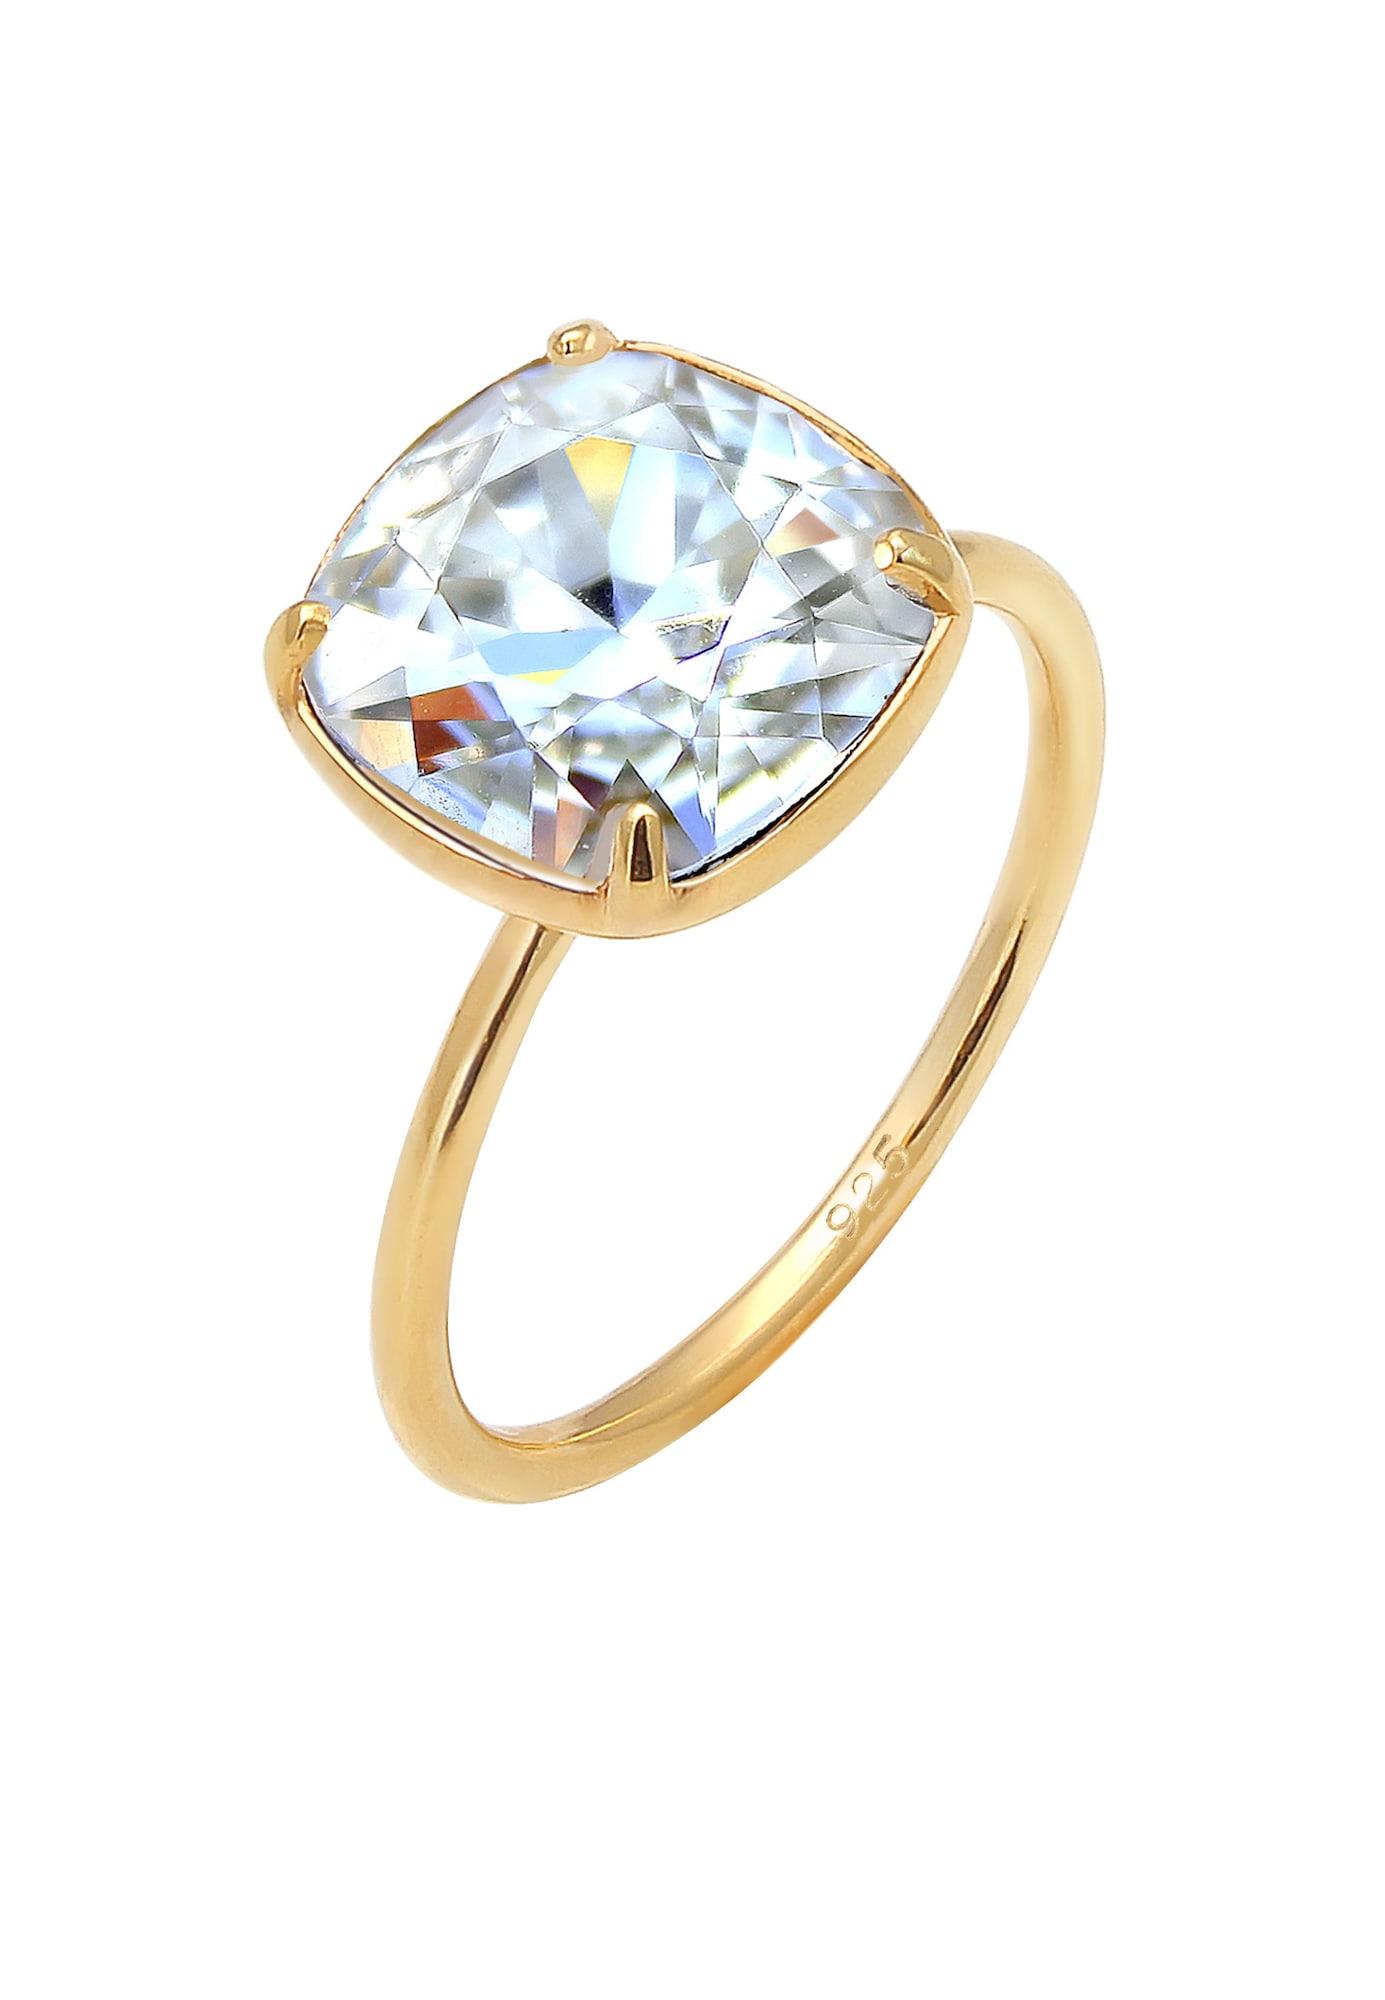 Ring Kristall Ring, Verlobungsring | Schmuck > Ringe > Verlobungsringe | Gold | ELLI